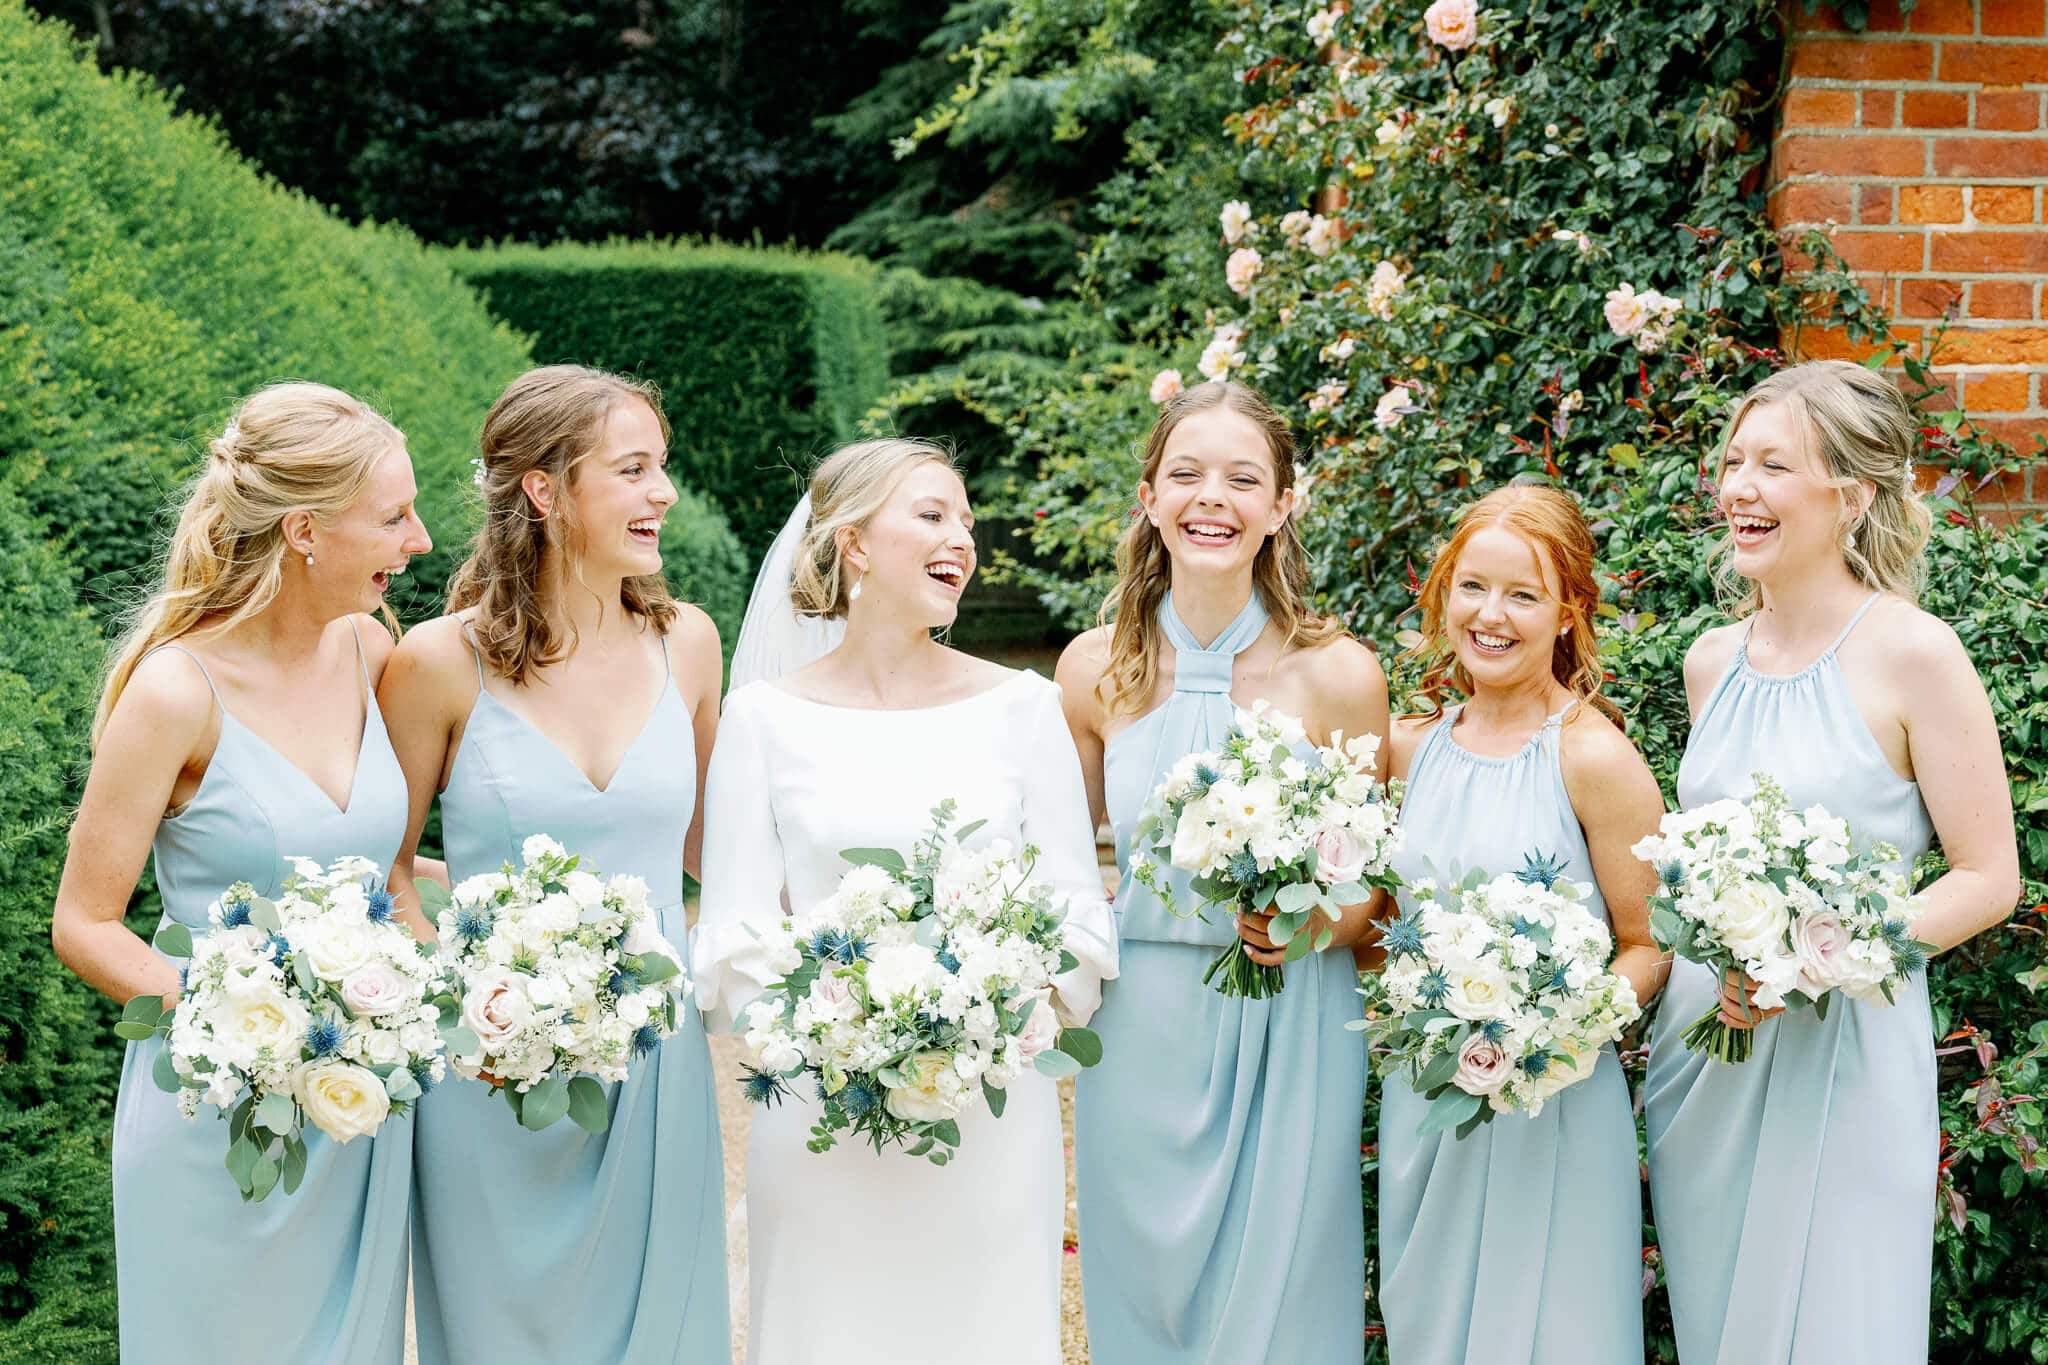 Lains Barn wedding photos of bridesmaids